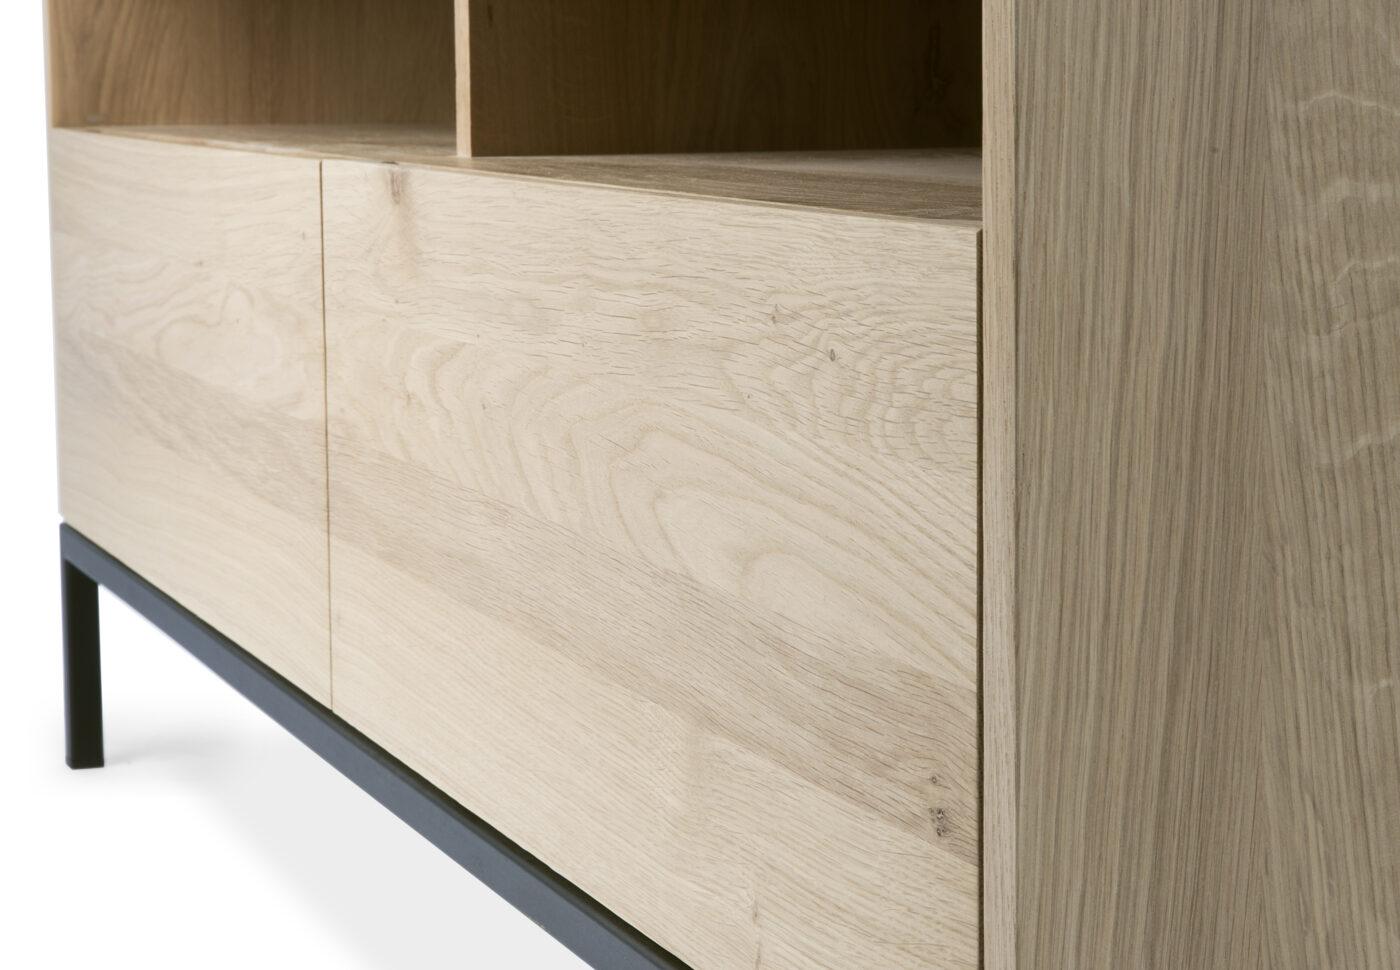 51118 Oak Ligna TV cupboard 2 drawers black metal legs det